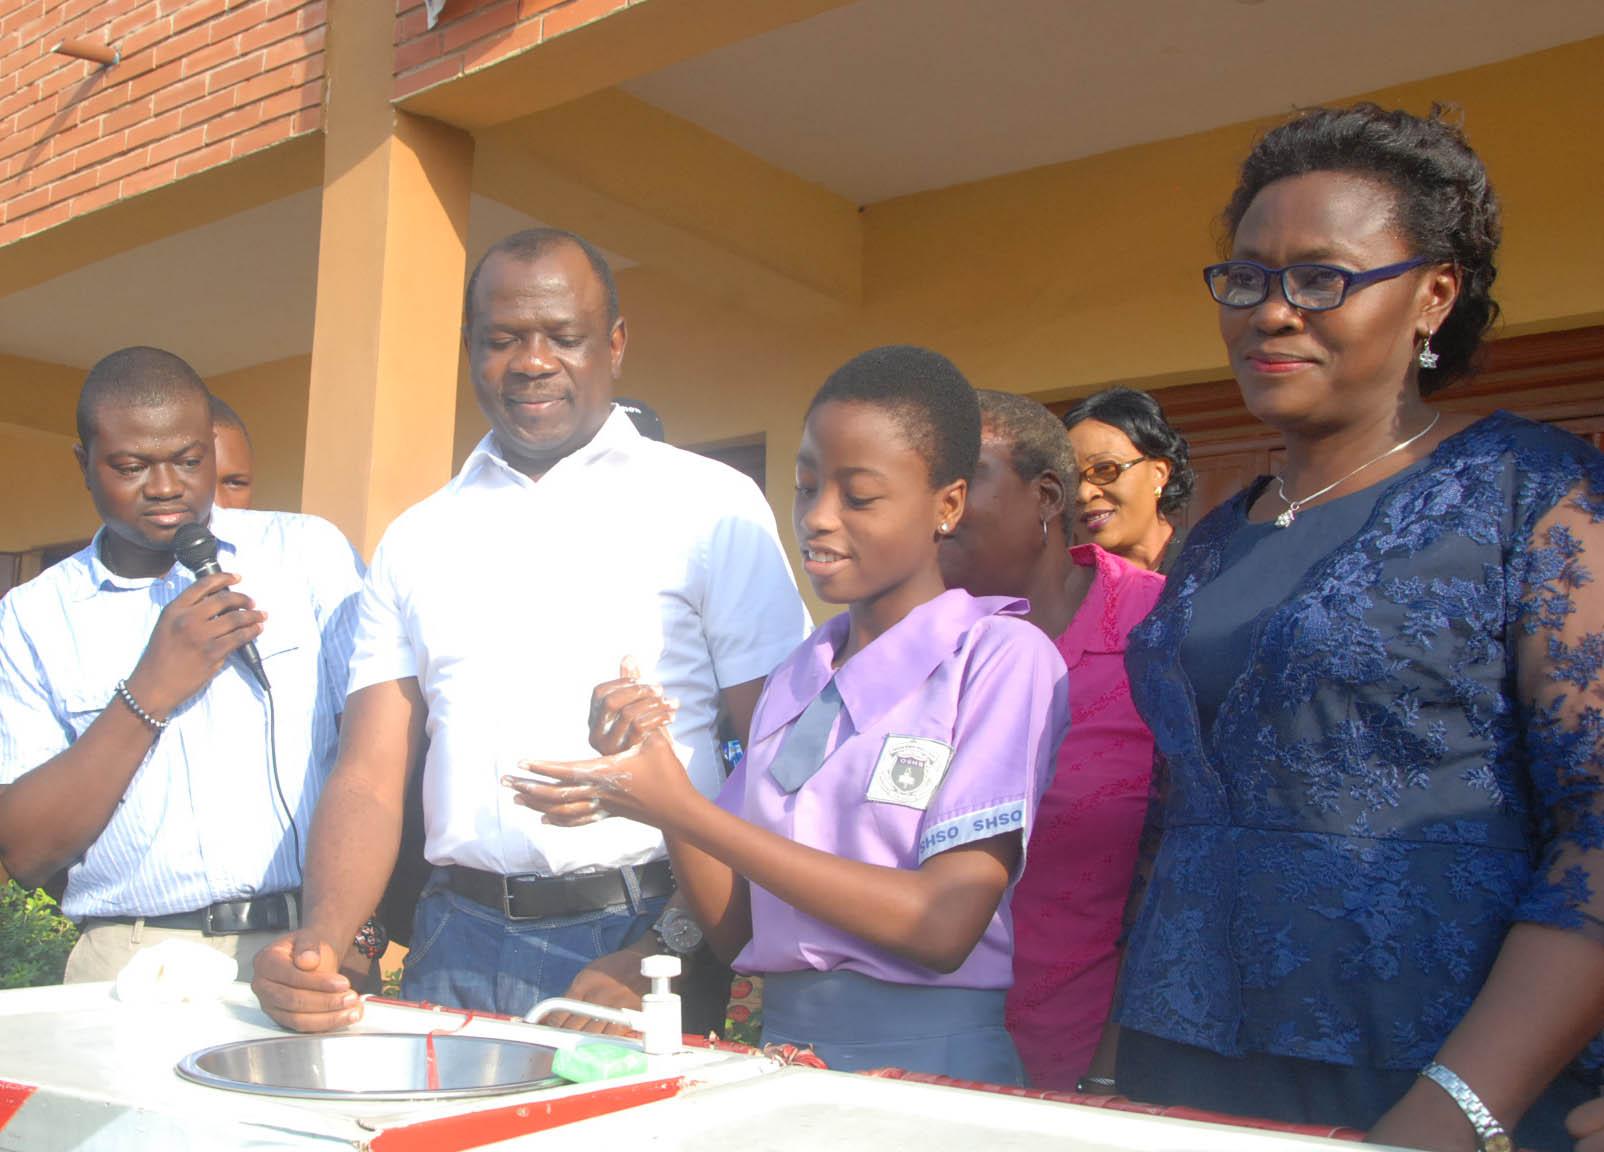 Unilever handwashing activity at Oregun High school 3